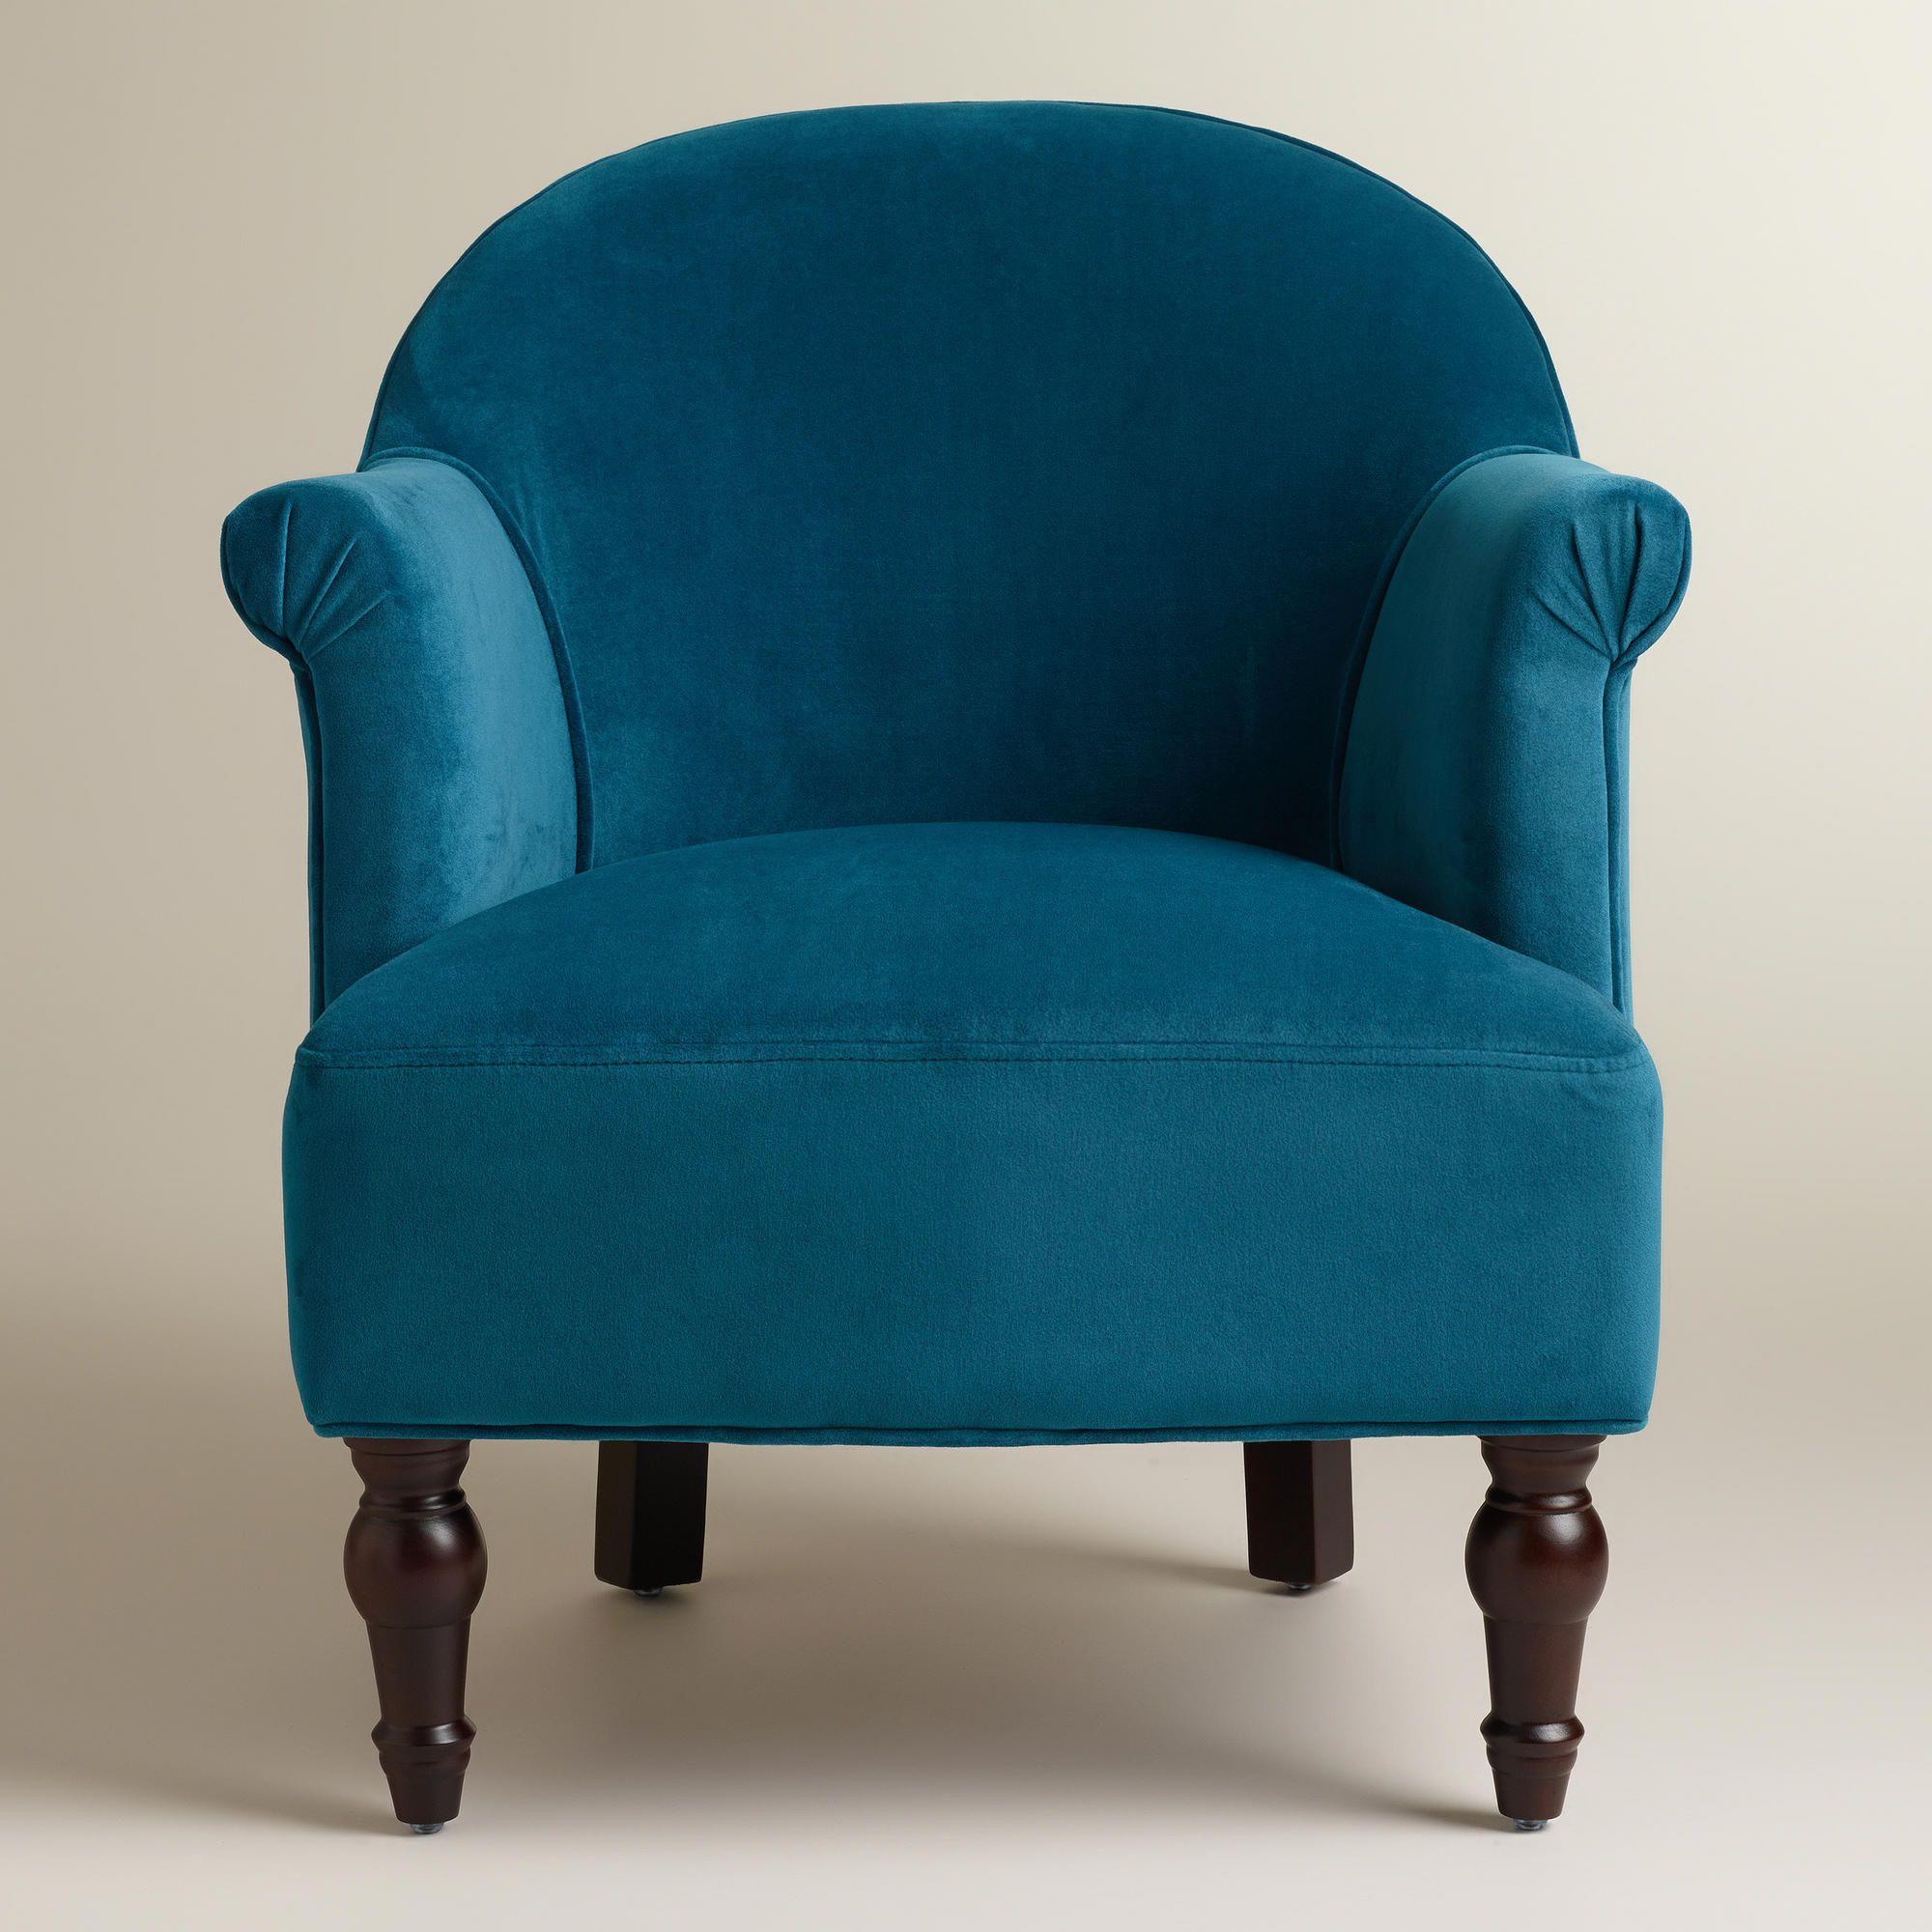 Wondrous Peacock Blue Lorna Chair World Market Chairs Blue Unemploymentrelief Wooden Chair Designs For Living Room Unemploymentrelieforg